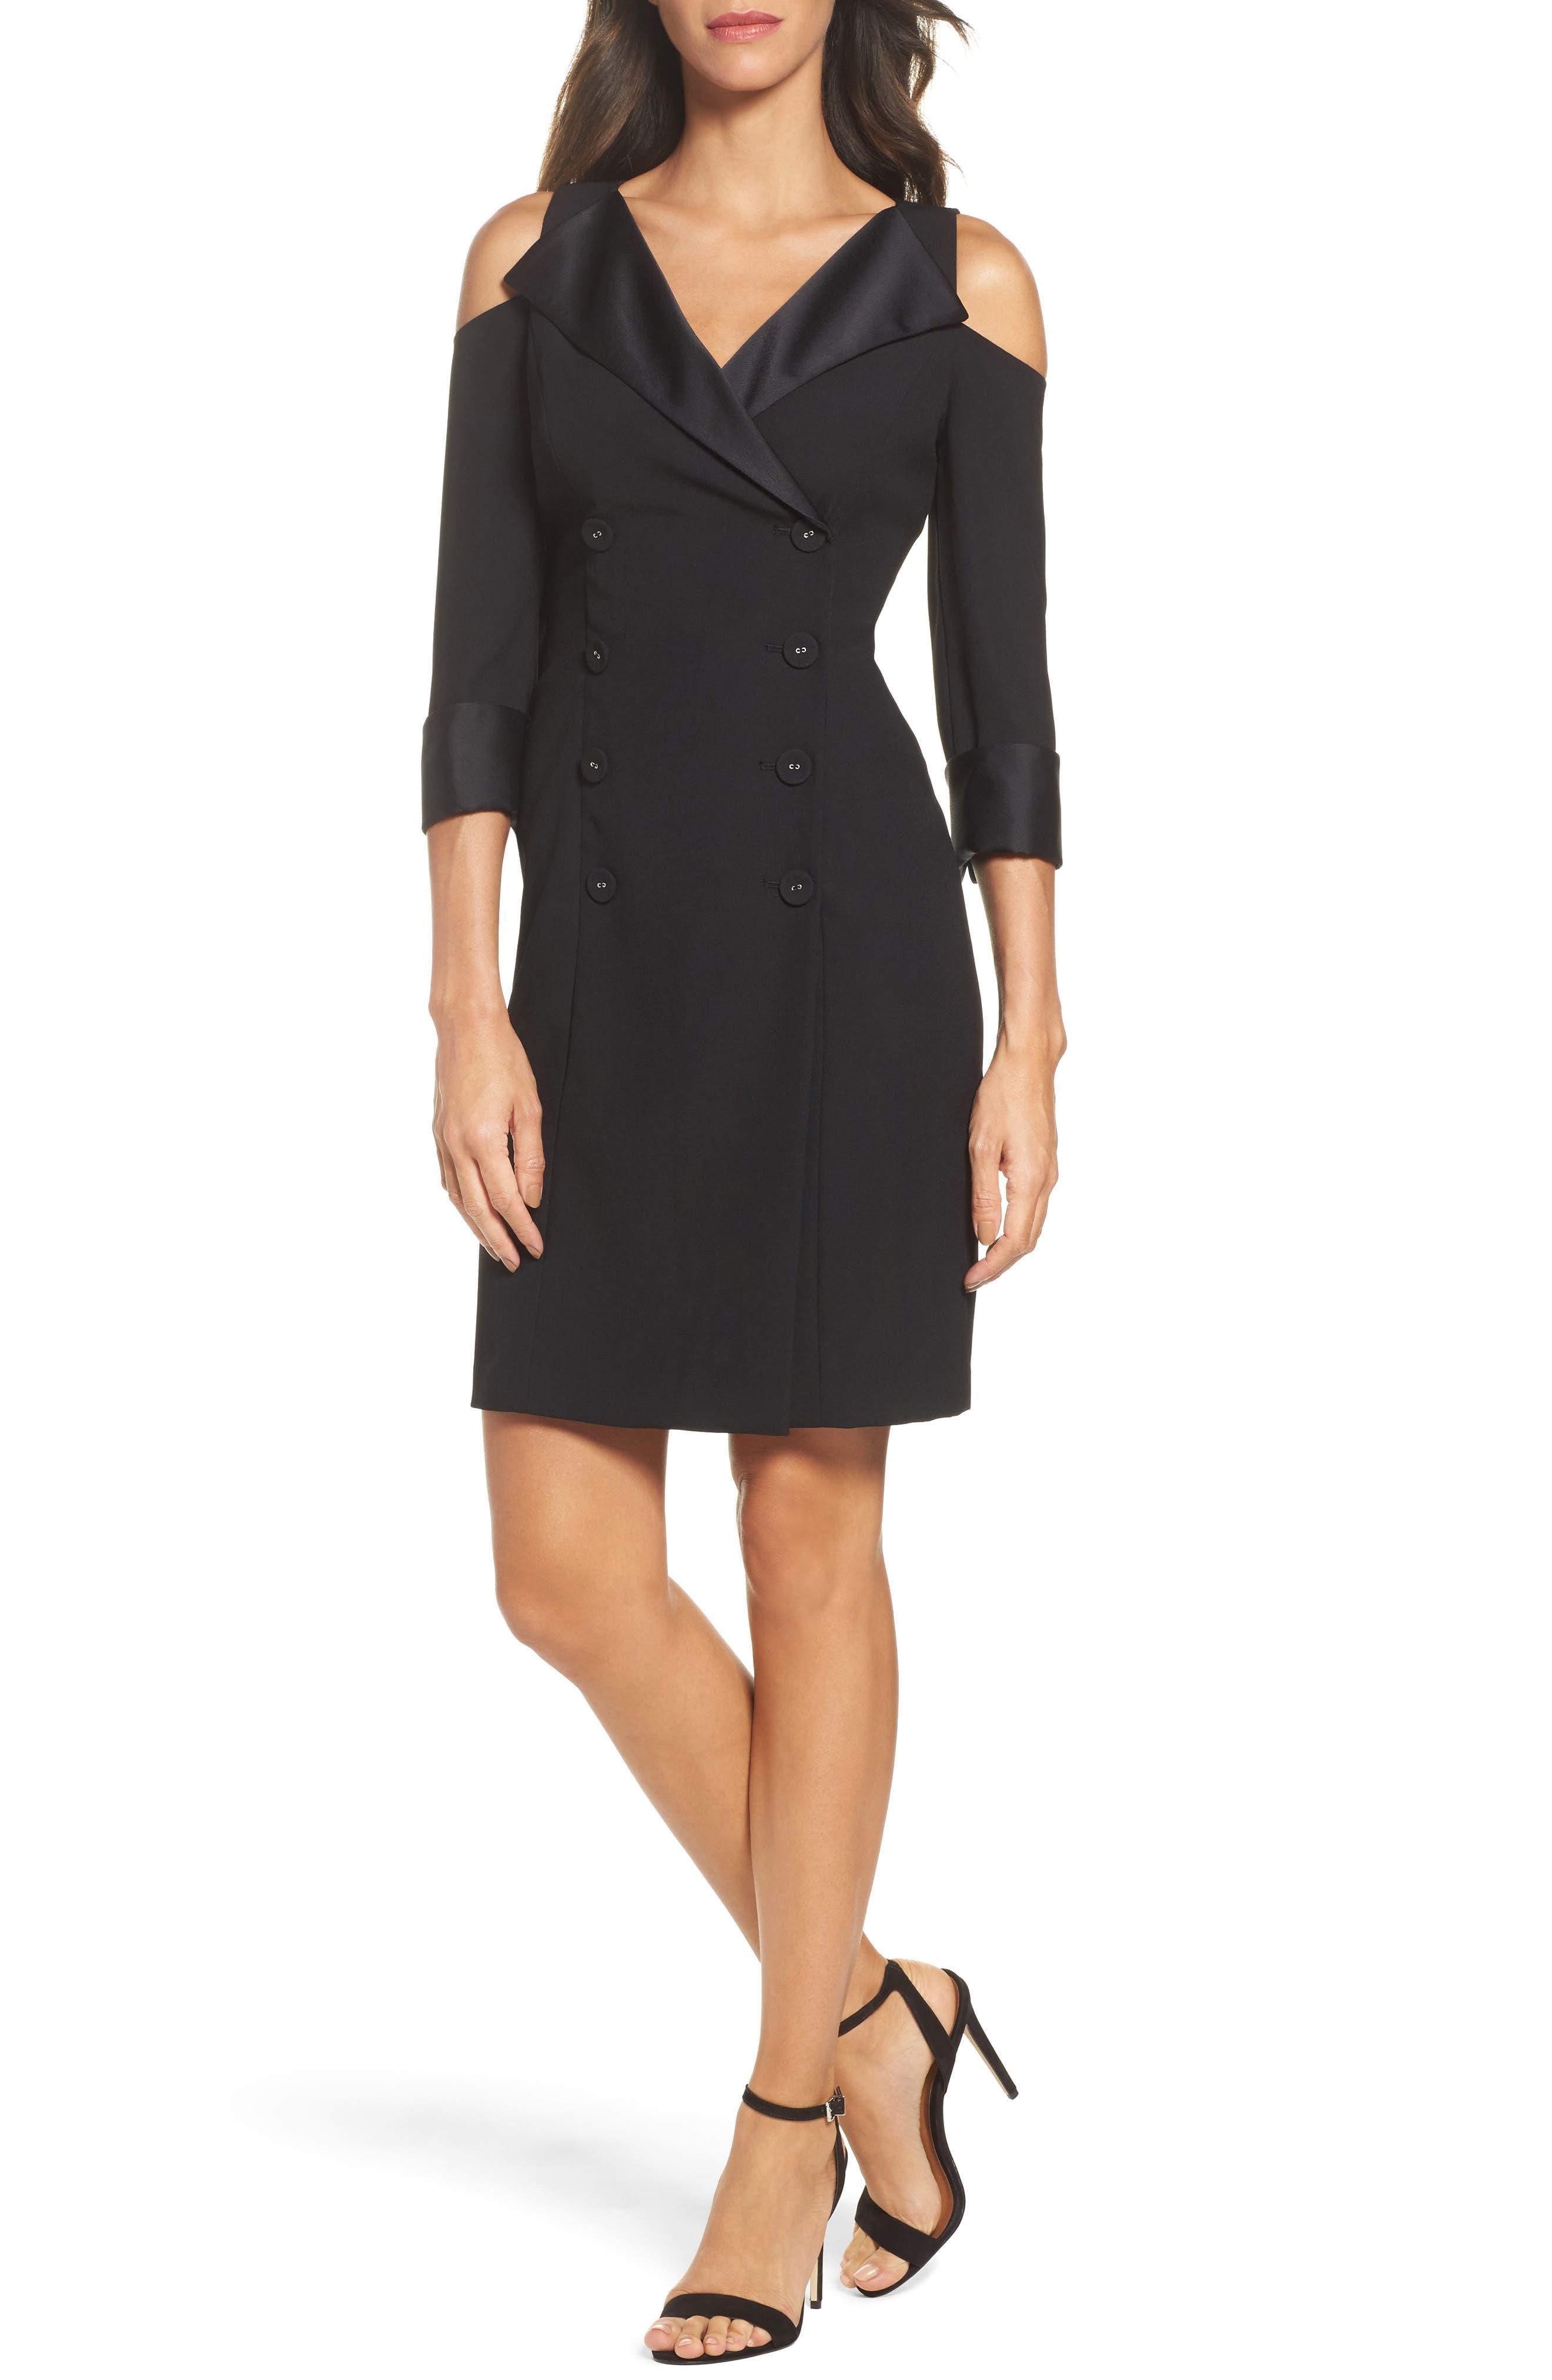 Main Image - Adrianna Papell Tuxedo Cold Shoulder Sheath Dress